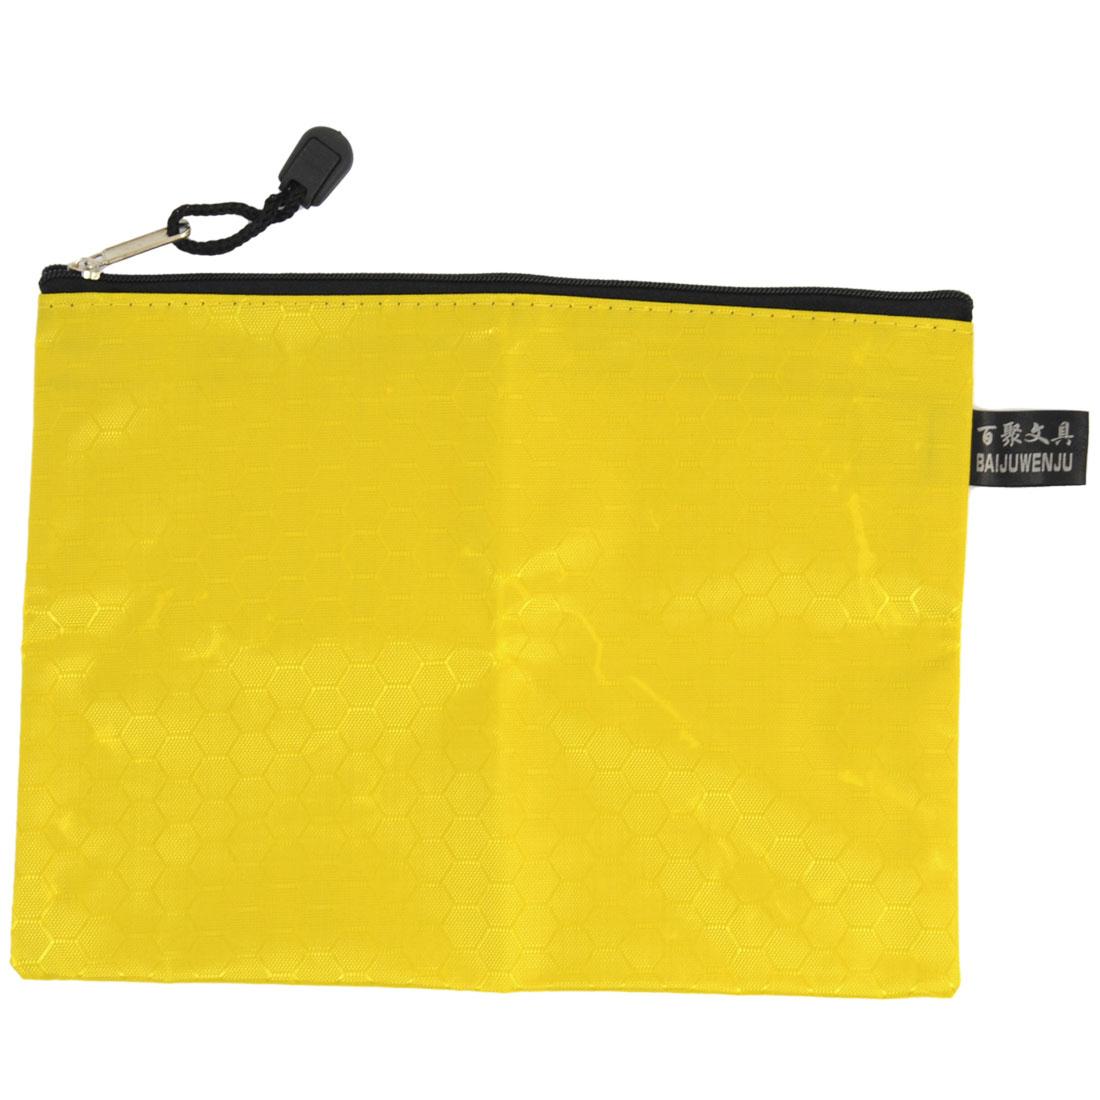 "9"" Length Hexagon Printed Nylon Zipper Closure A5 Paper Document Bag Yellow"